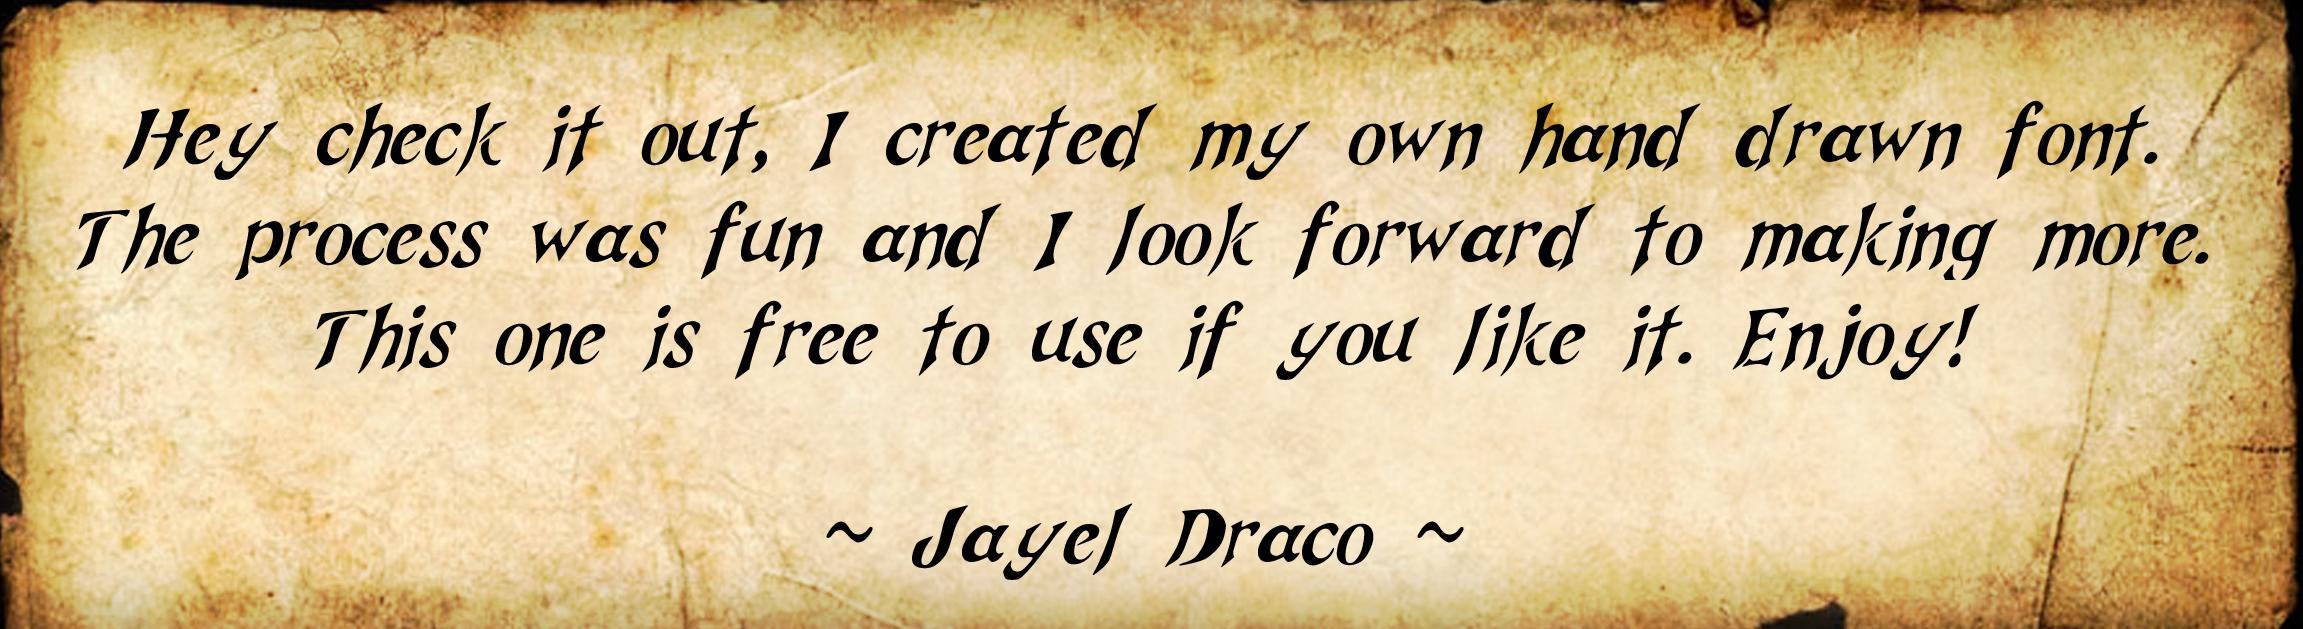 Jayel Draco font sample text